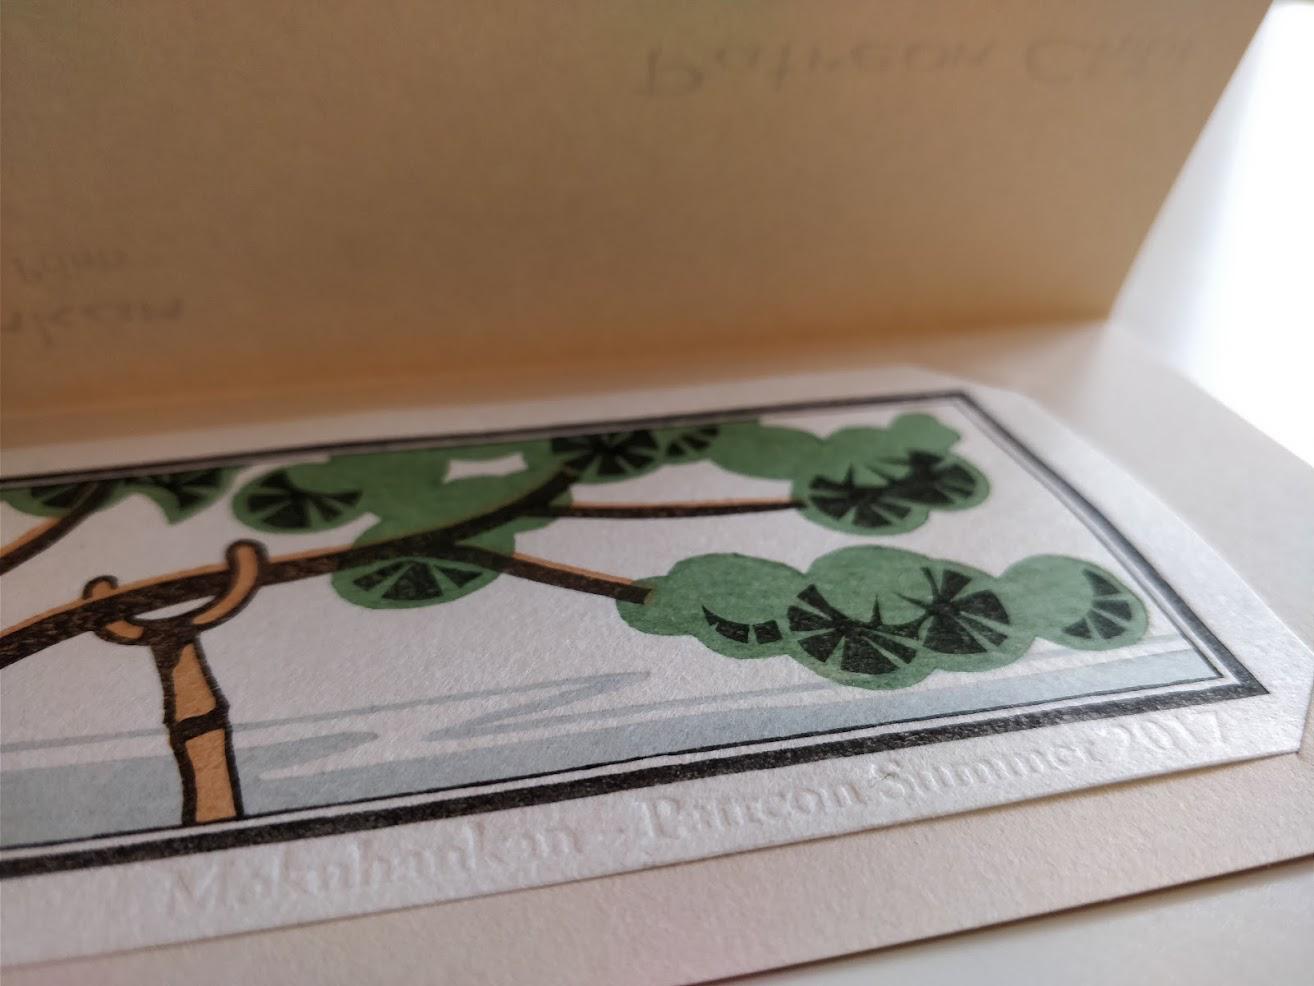 Mokuhankan Patreon - Miniature woodblock print from the Mokuhankan studio - design by John Amoss.